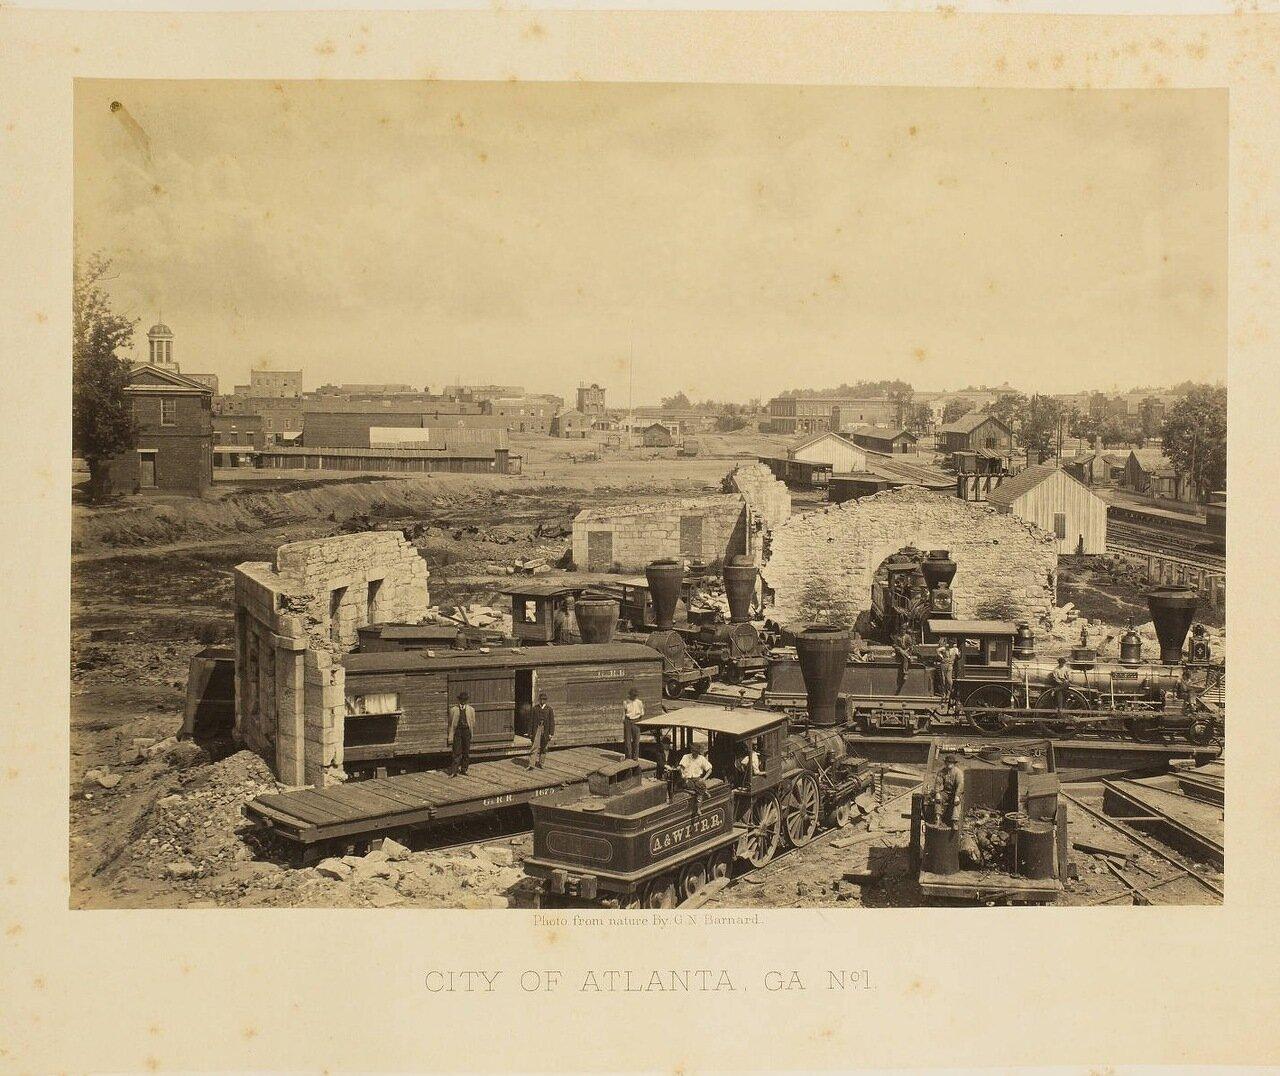 Атланта, Джорджия. №1